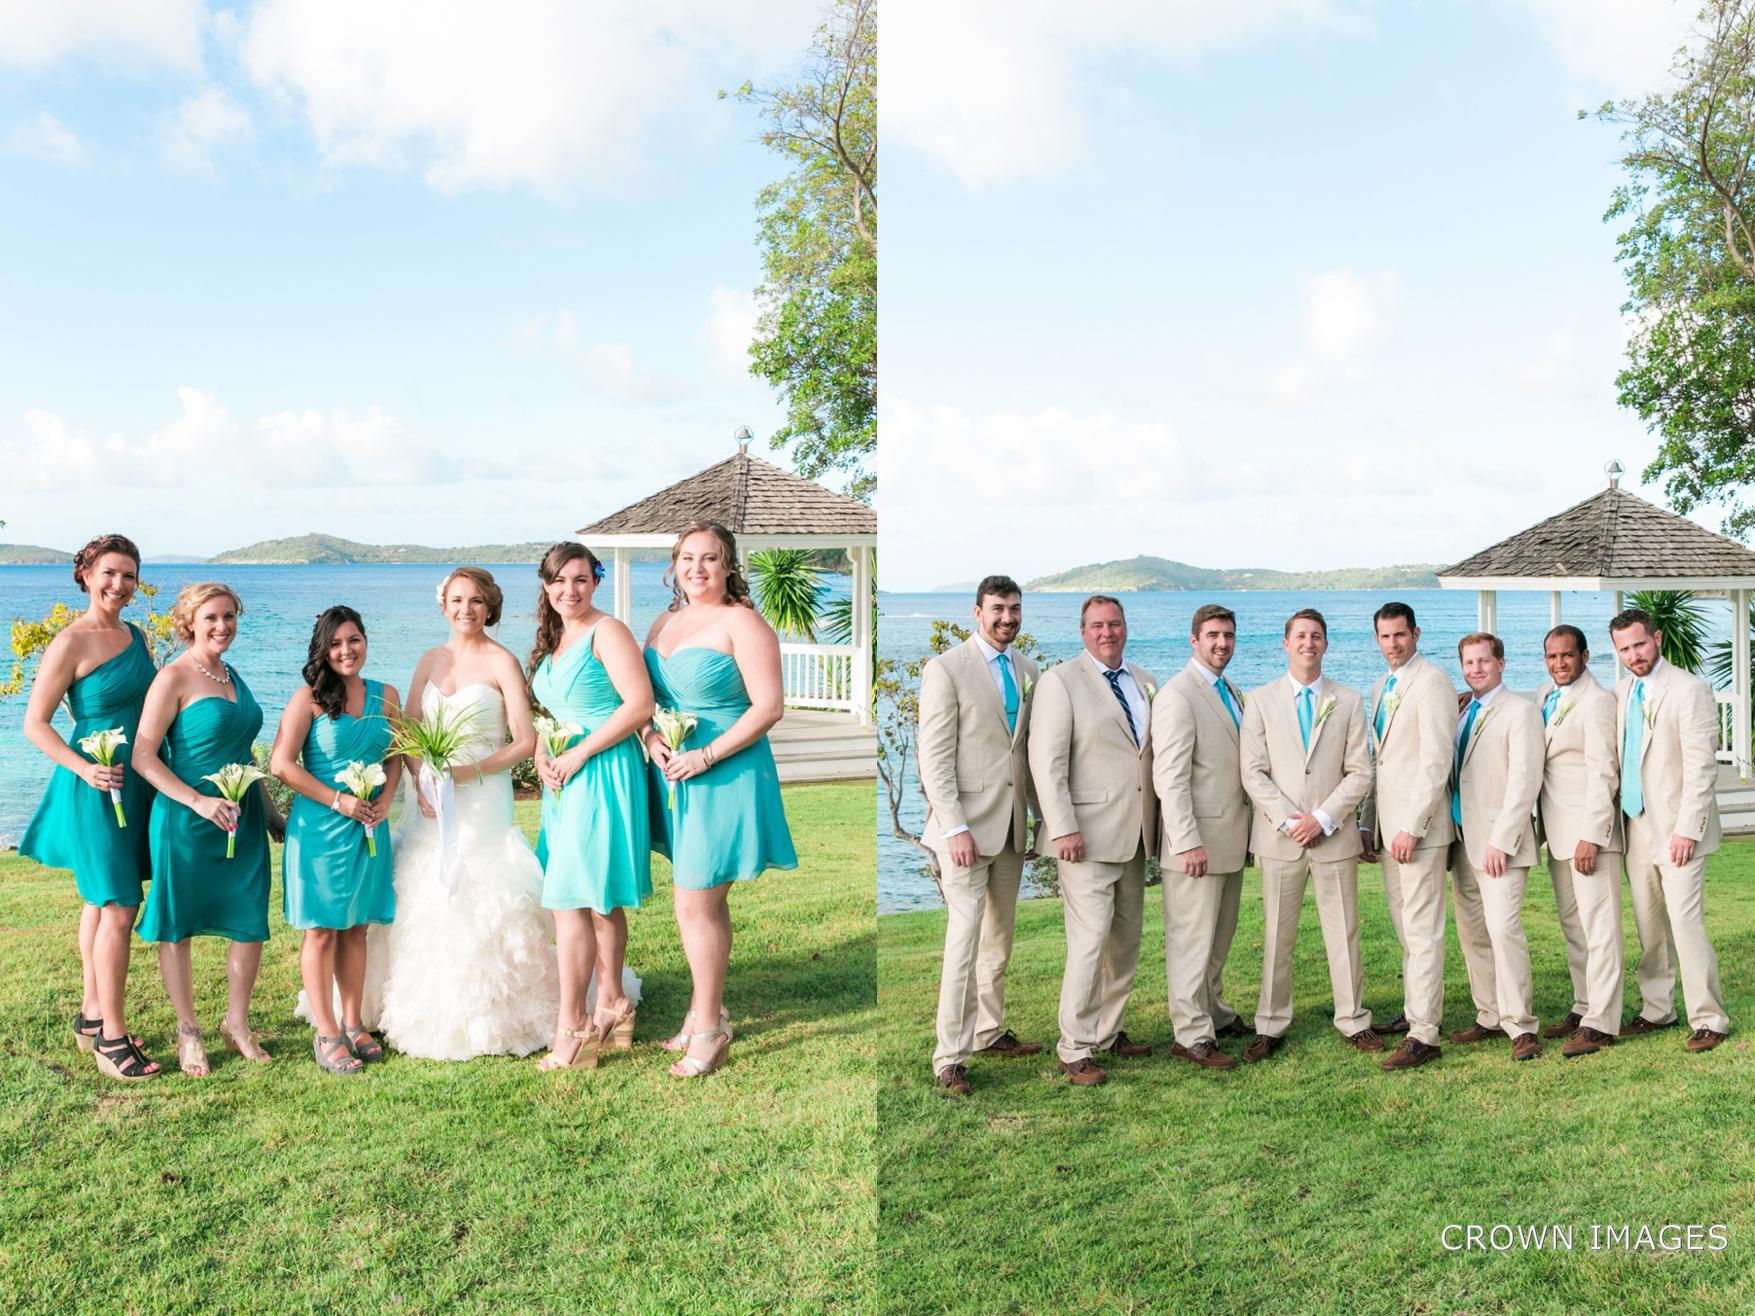 st_john_wedding_photographer_0369.jpg